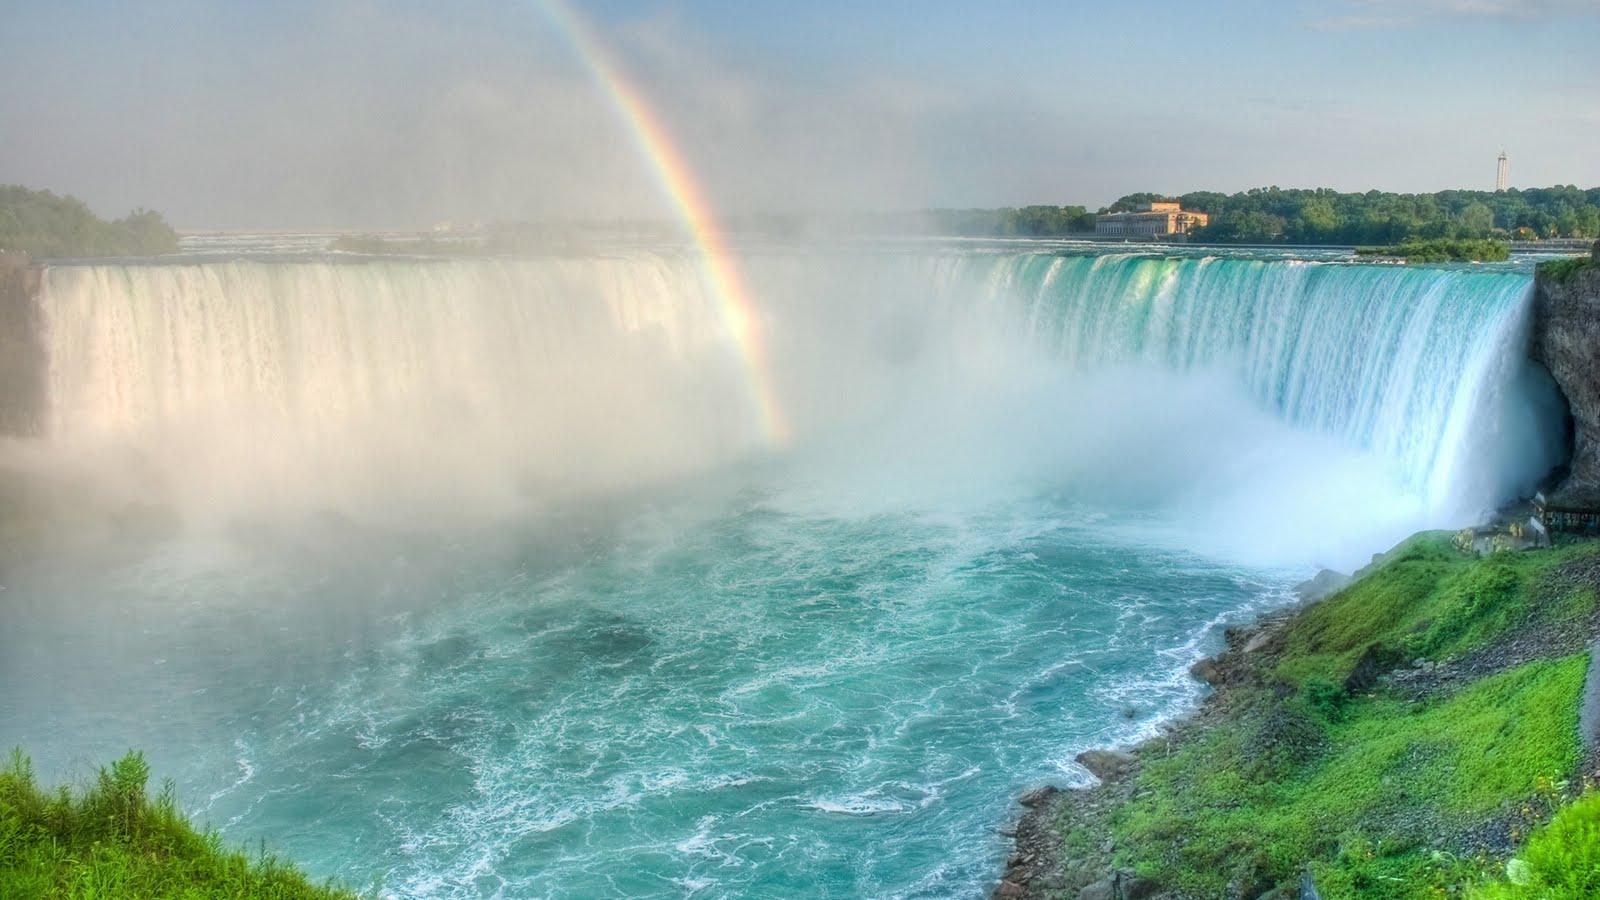 http://4.bp.blogspot.com/_ntaO39RNHbQ/TAM6lGGGvfI/AAAAAAAACII/w2jc5egAYtU/s1600/Horseshoe_Falls_rainbow_1920x1080+HDTV+1080p.jpg